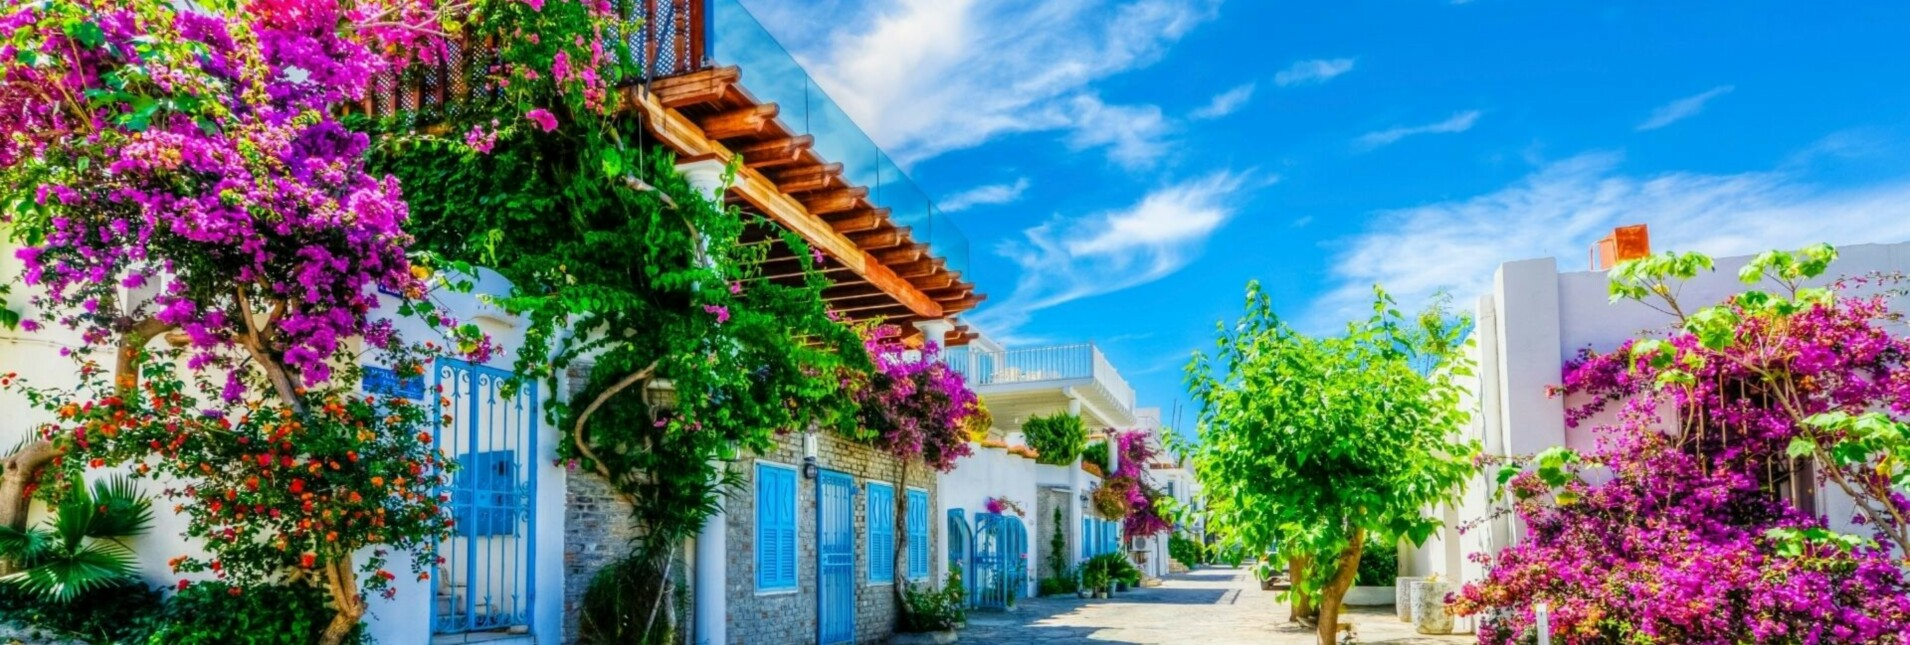 4* Costa Venezia - Türkei & Griechenland Route A inkl. Flug